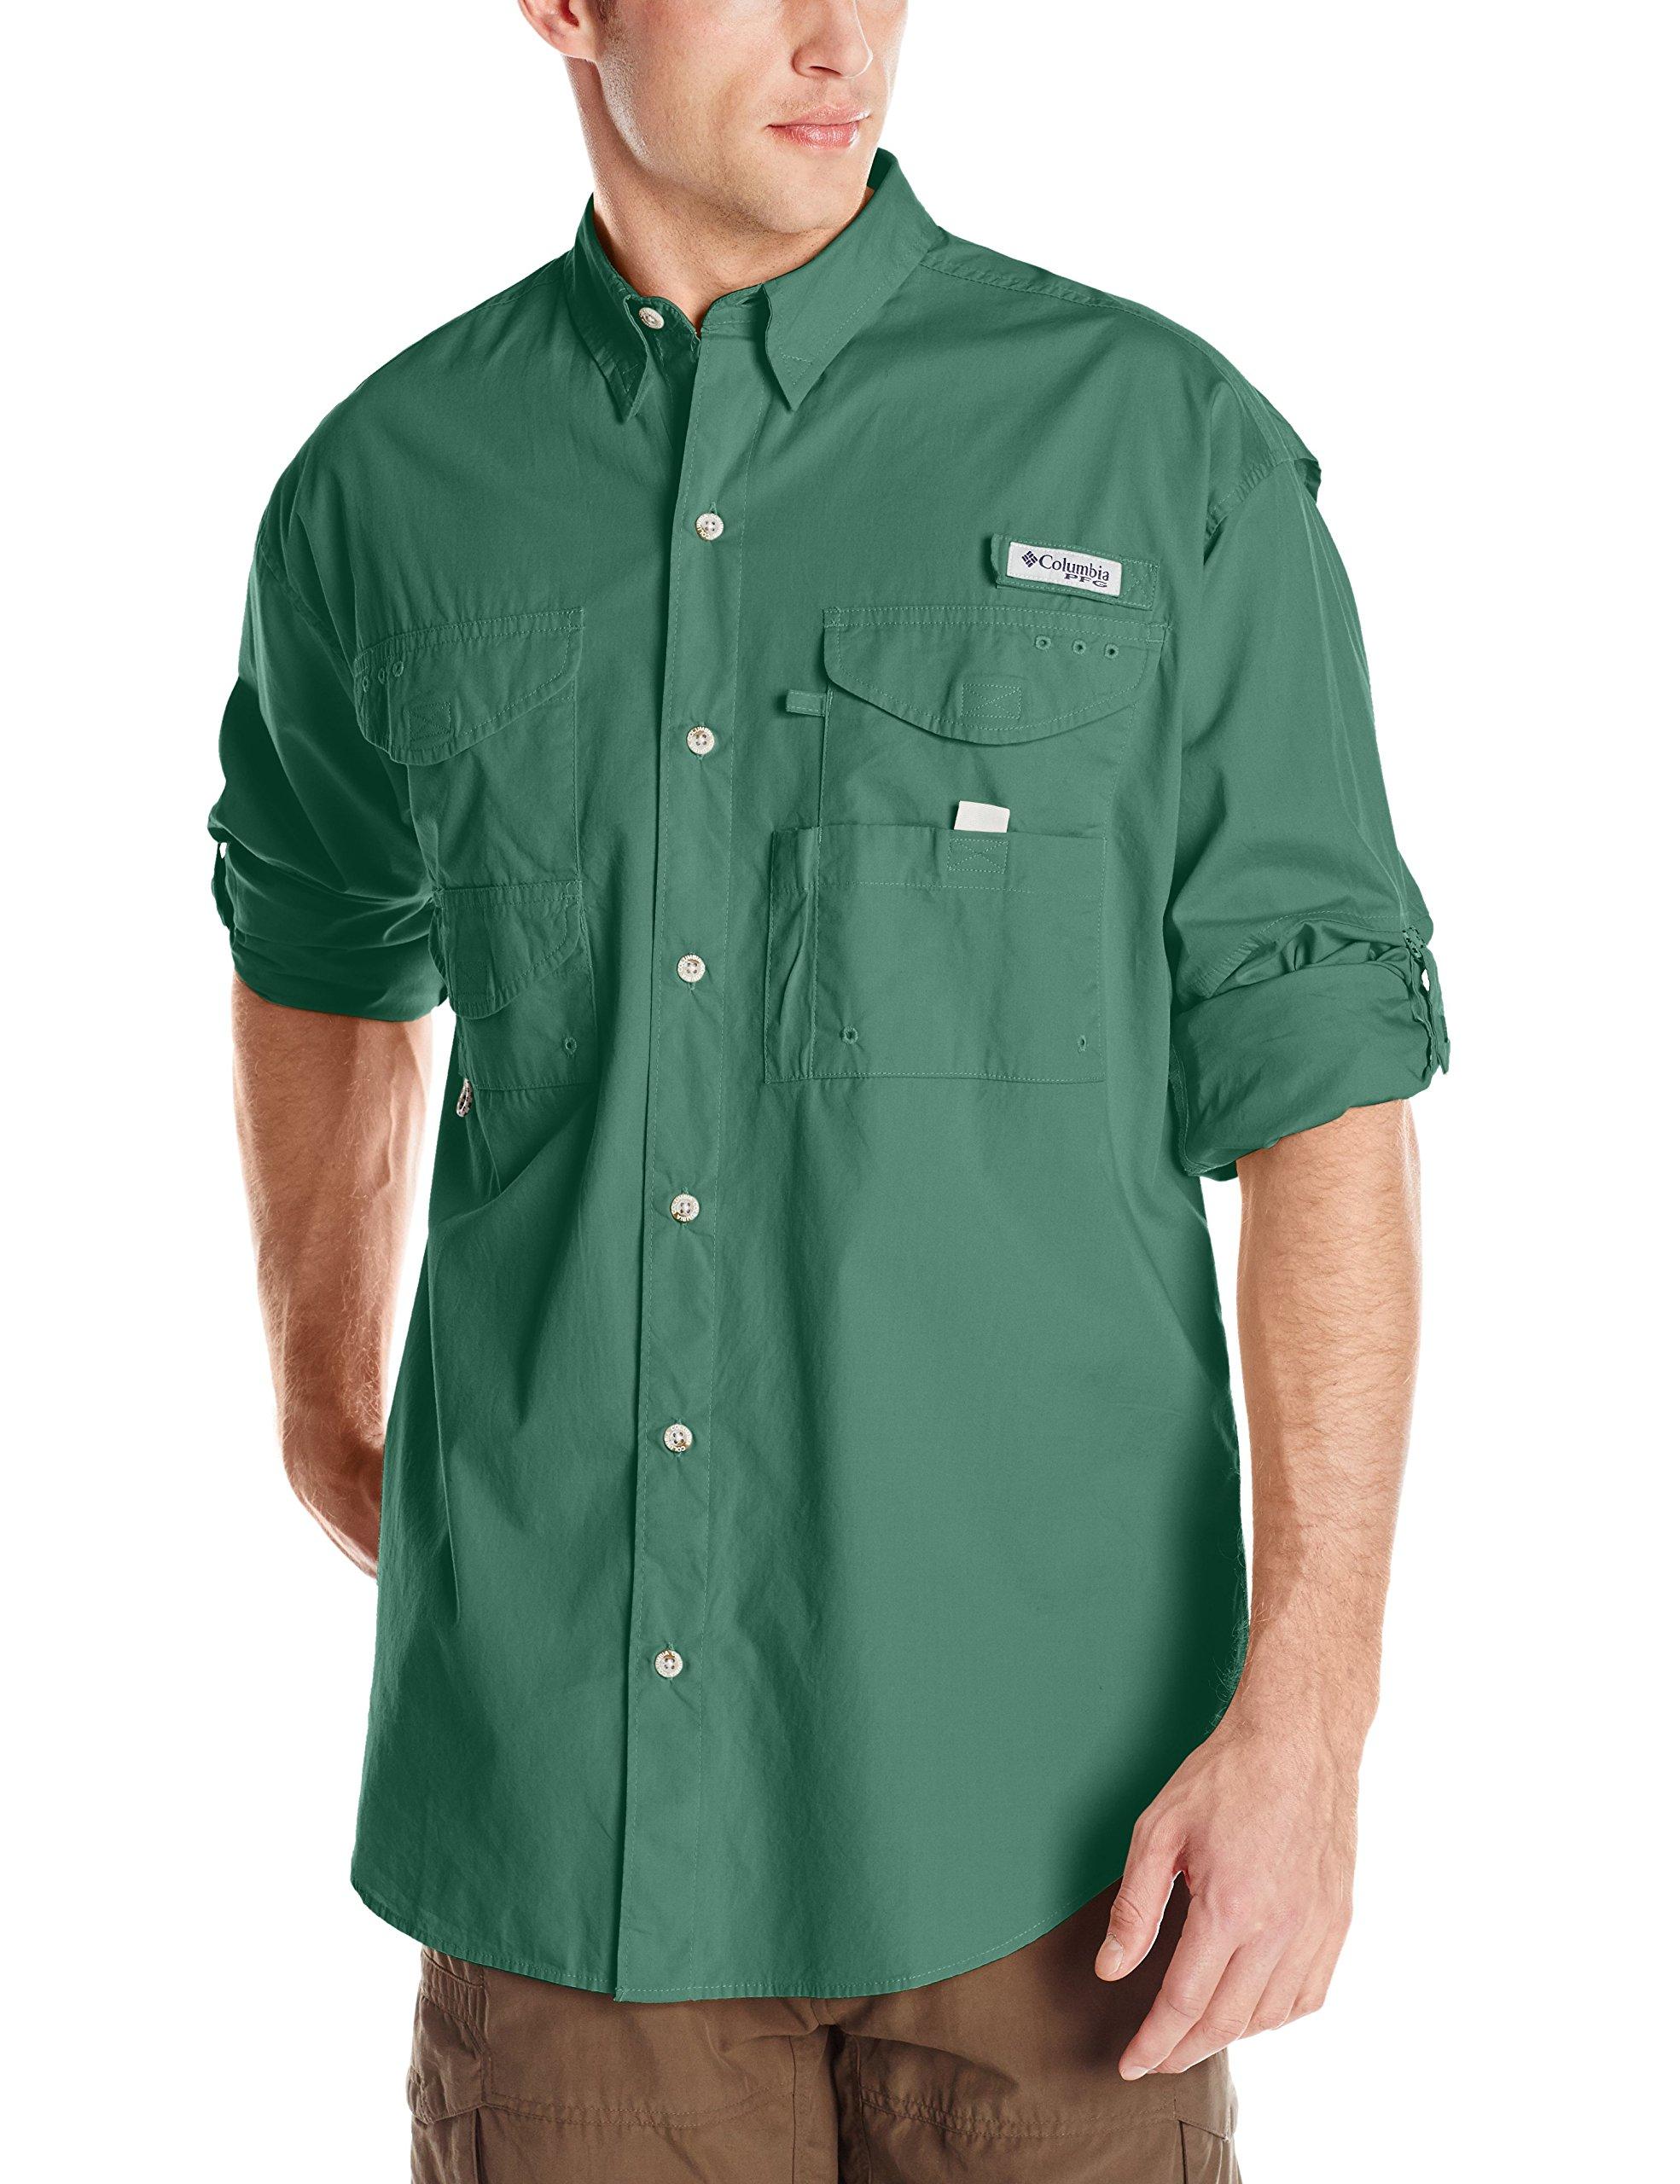 Columbia Men's Bonehead Big & Tall Long Sleeve Shirt, Thyme Green, 3X